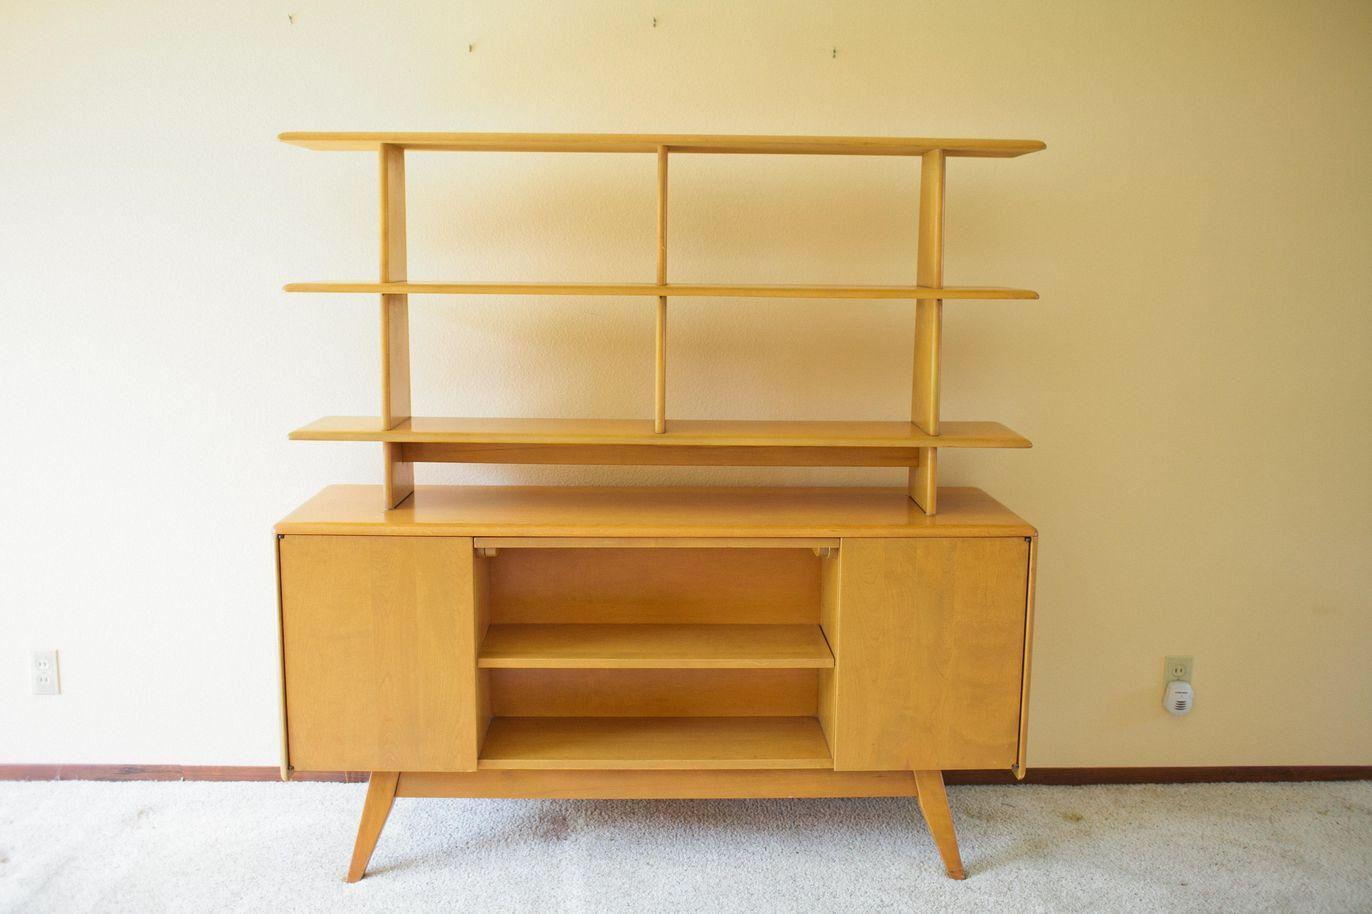 Heywood wakefield mid century modern room divider on chairish